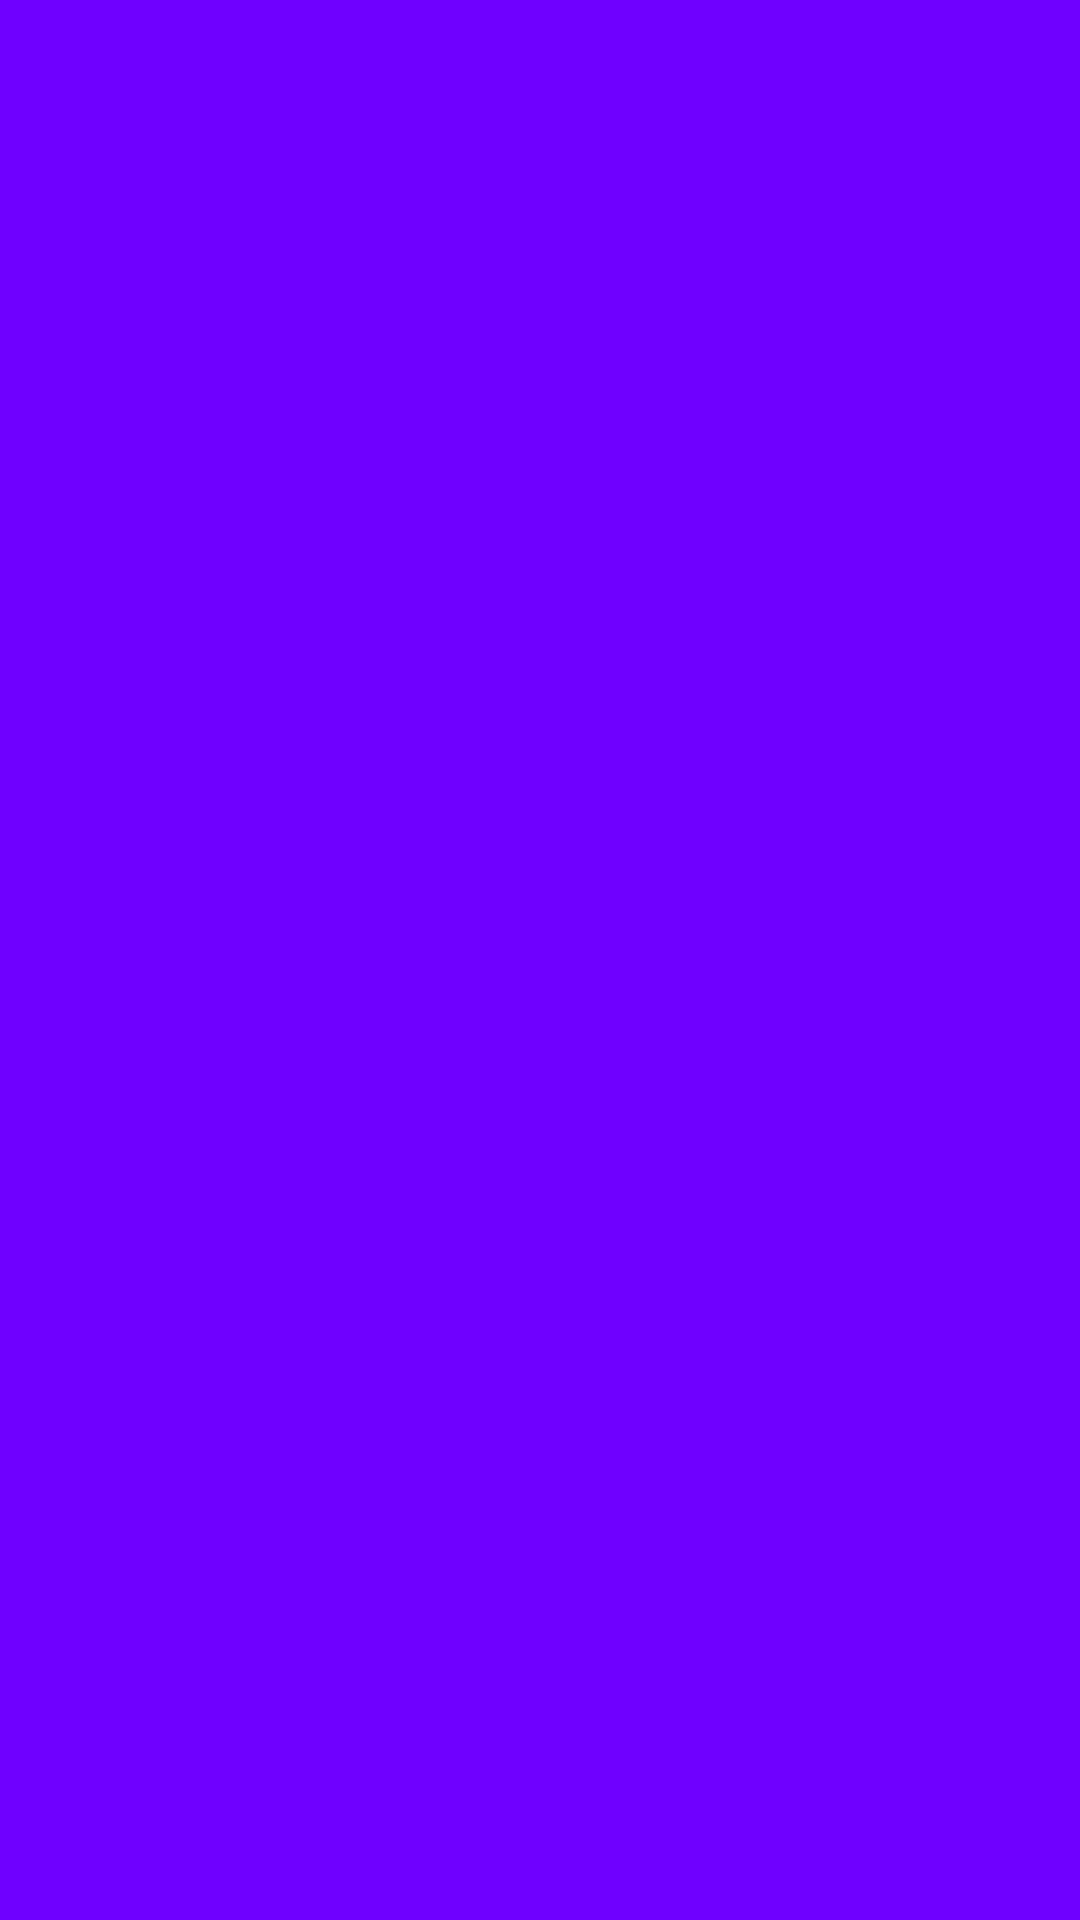 1080x1920 Electric Indigo Solid Color Background